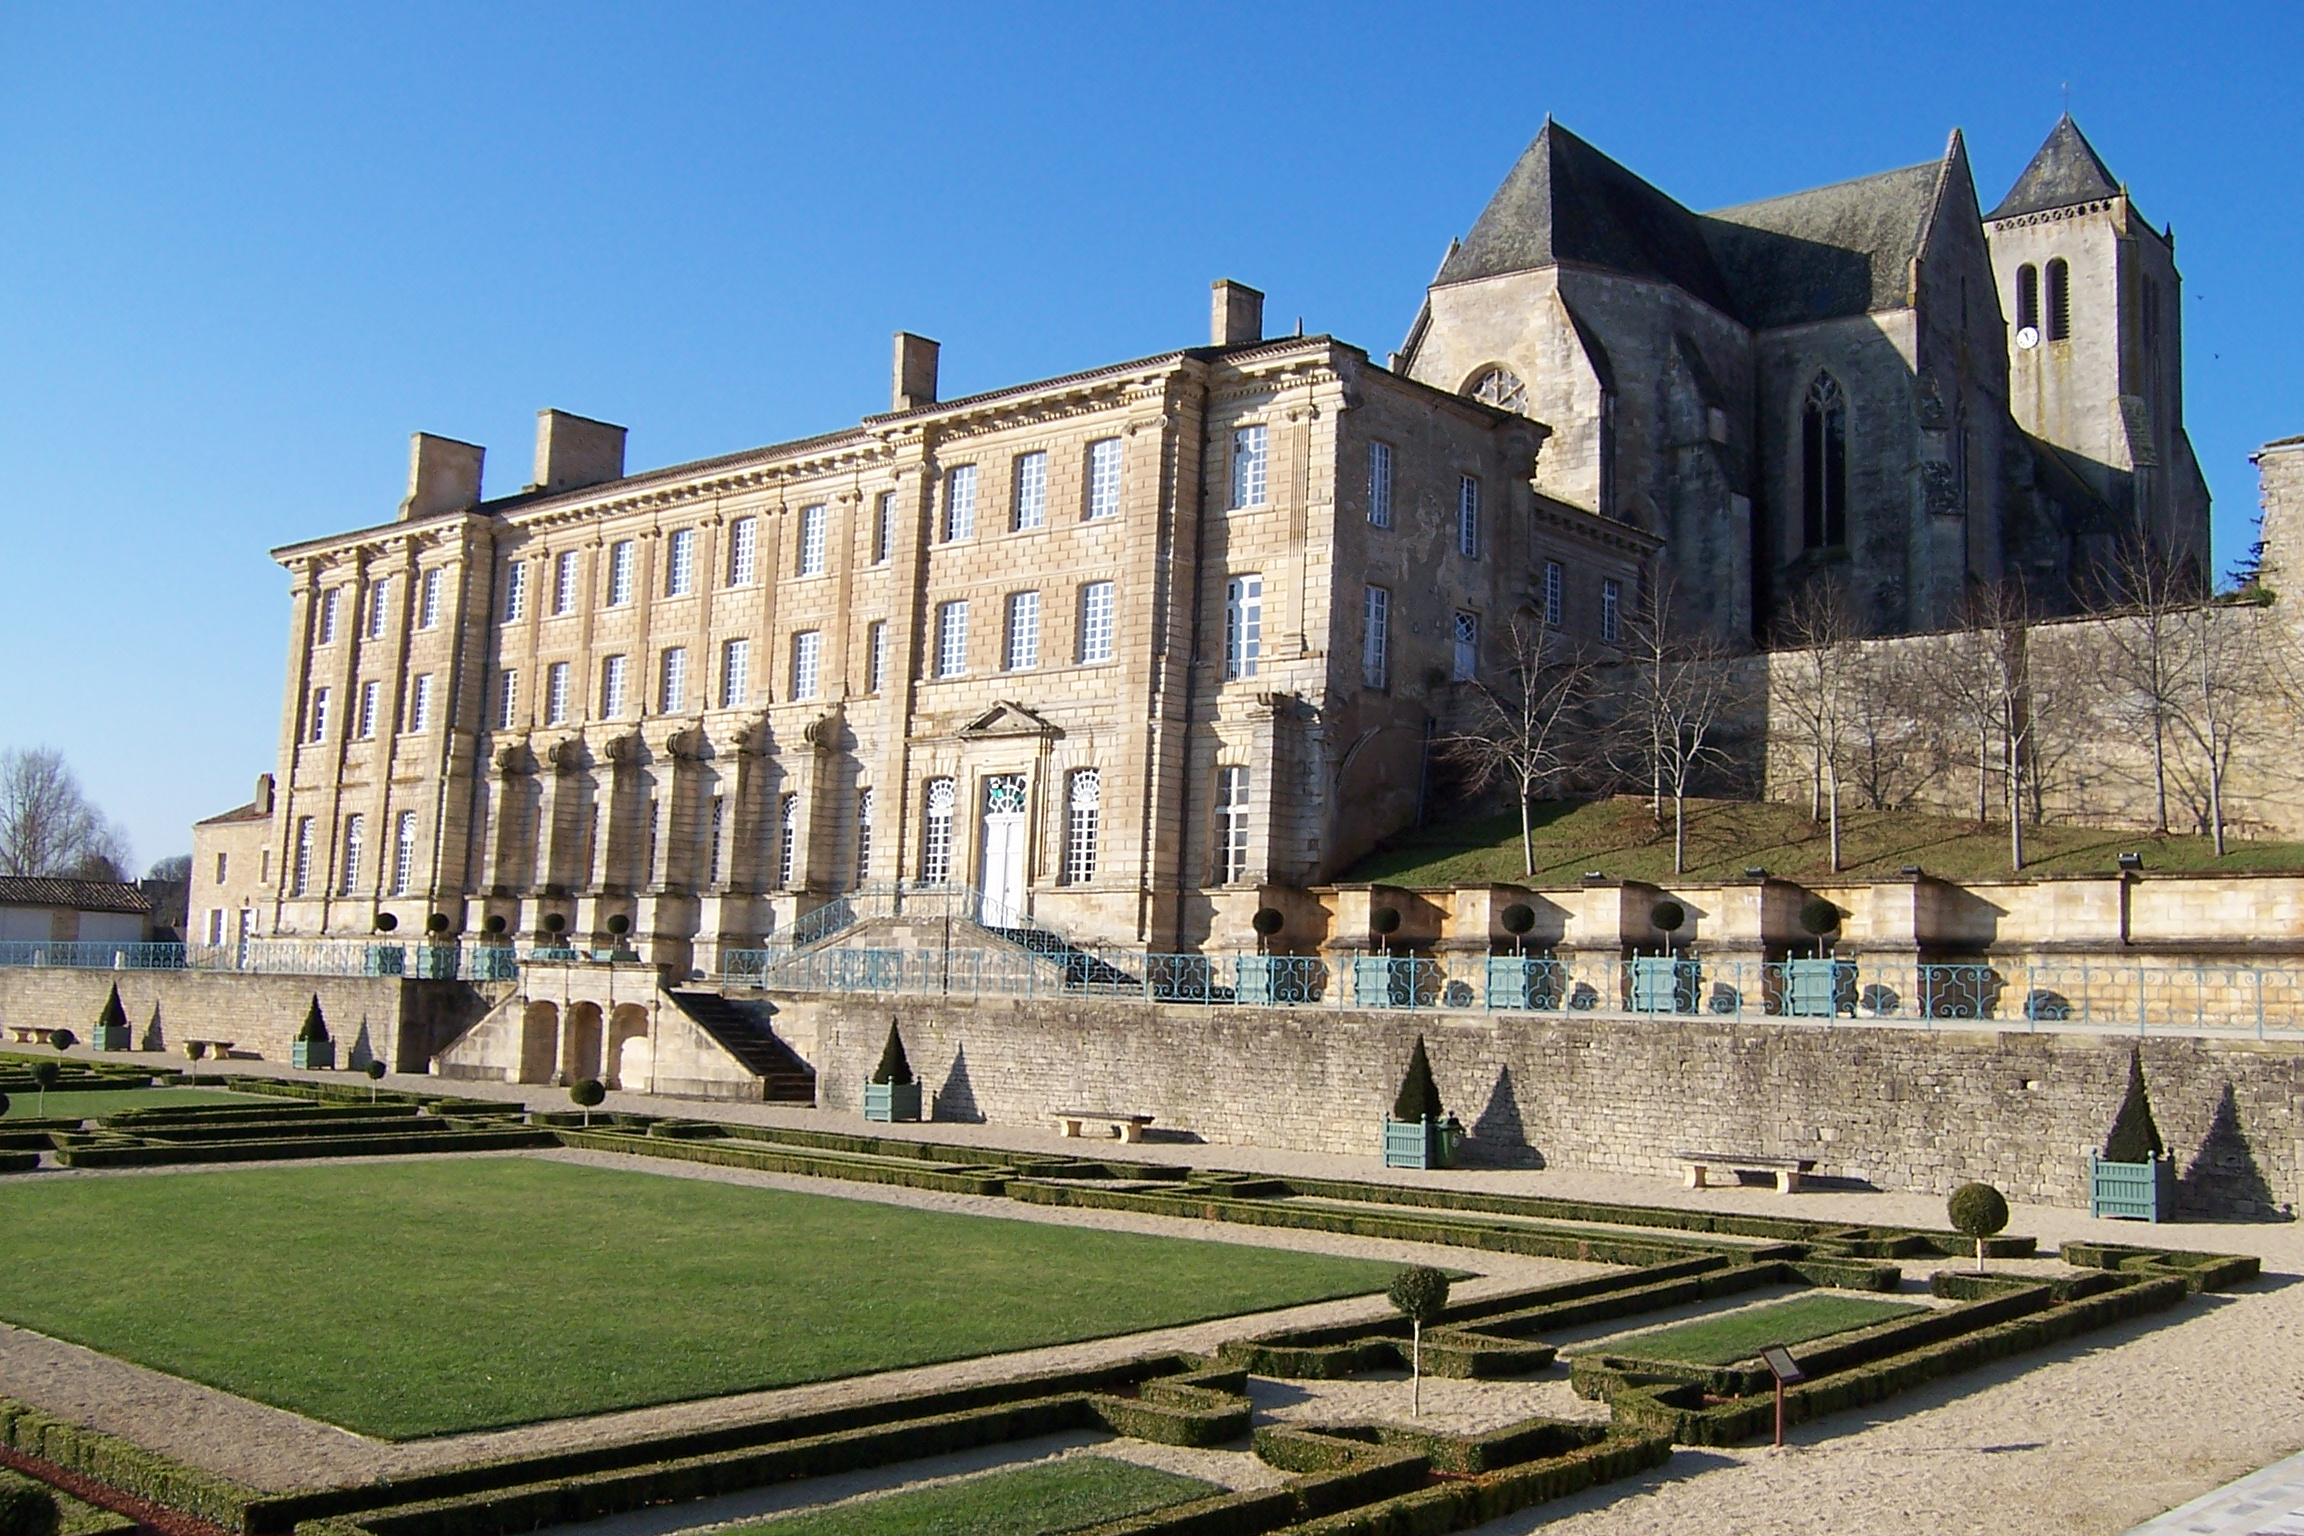 Voyages de Louis XI Wikiwand